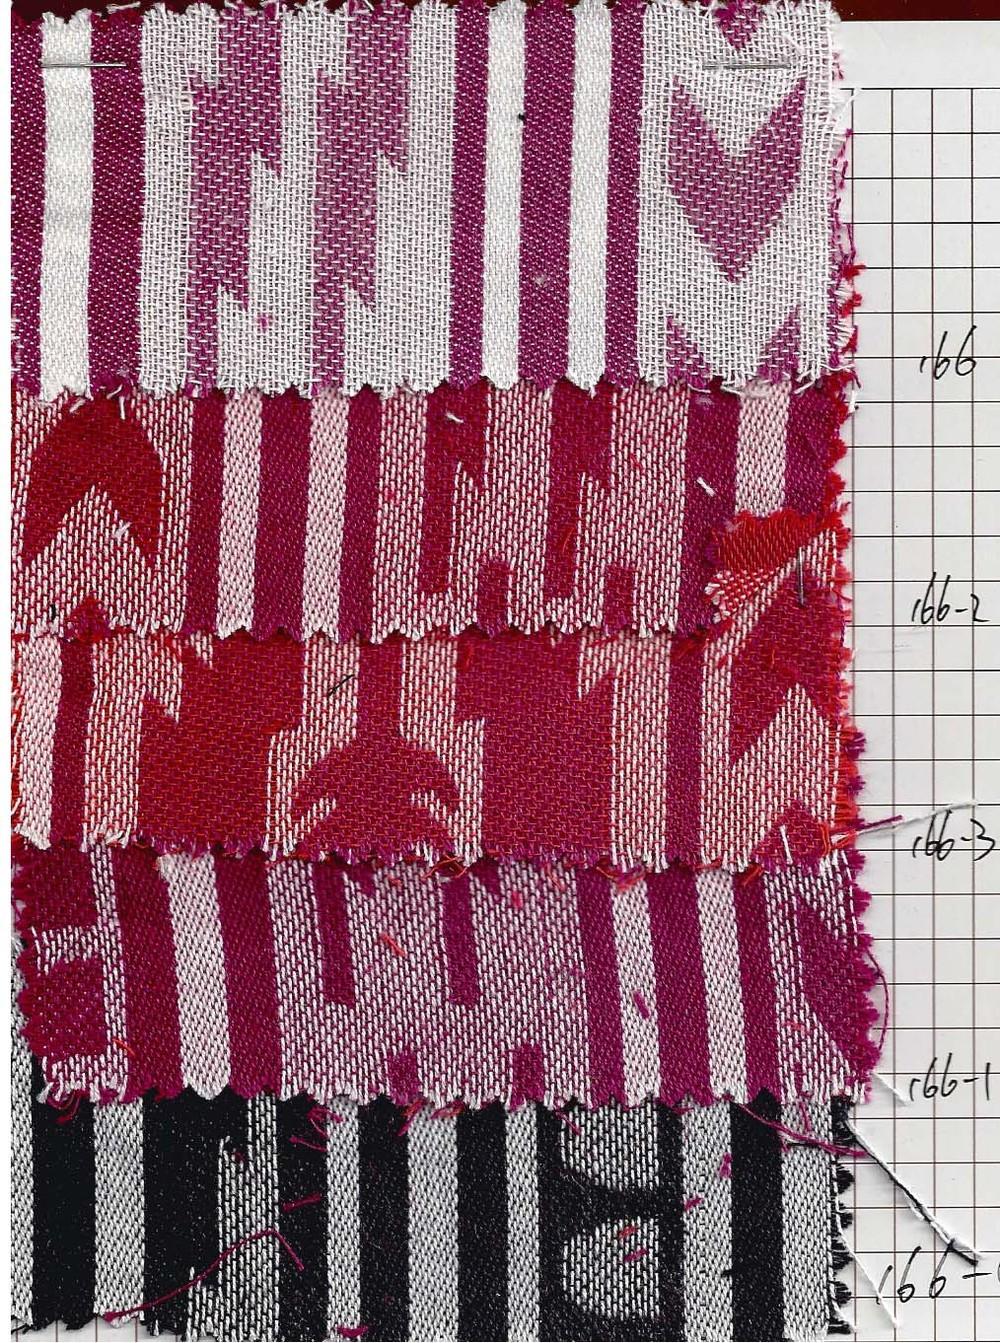 GZTY Textile 166.jpg